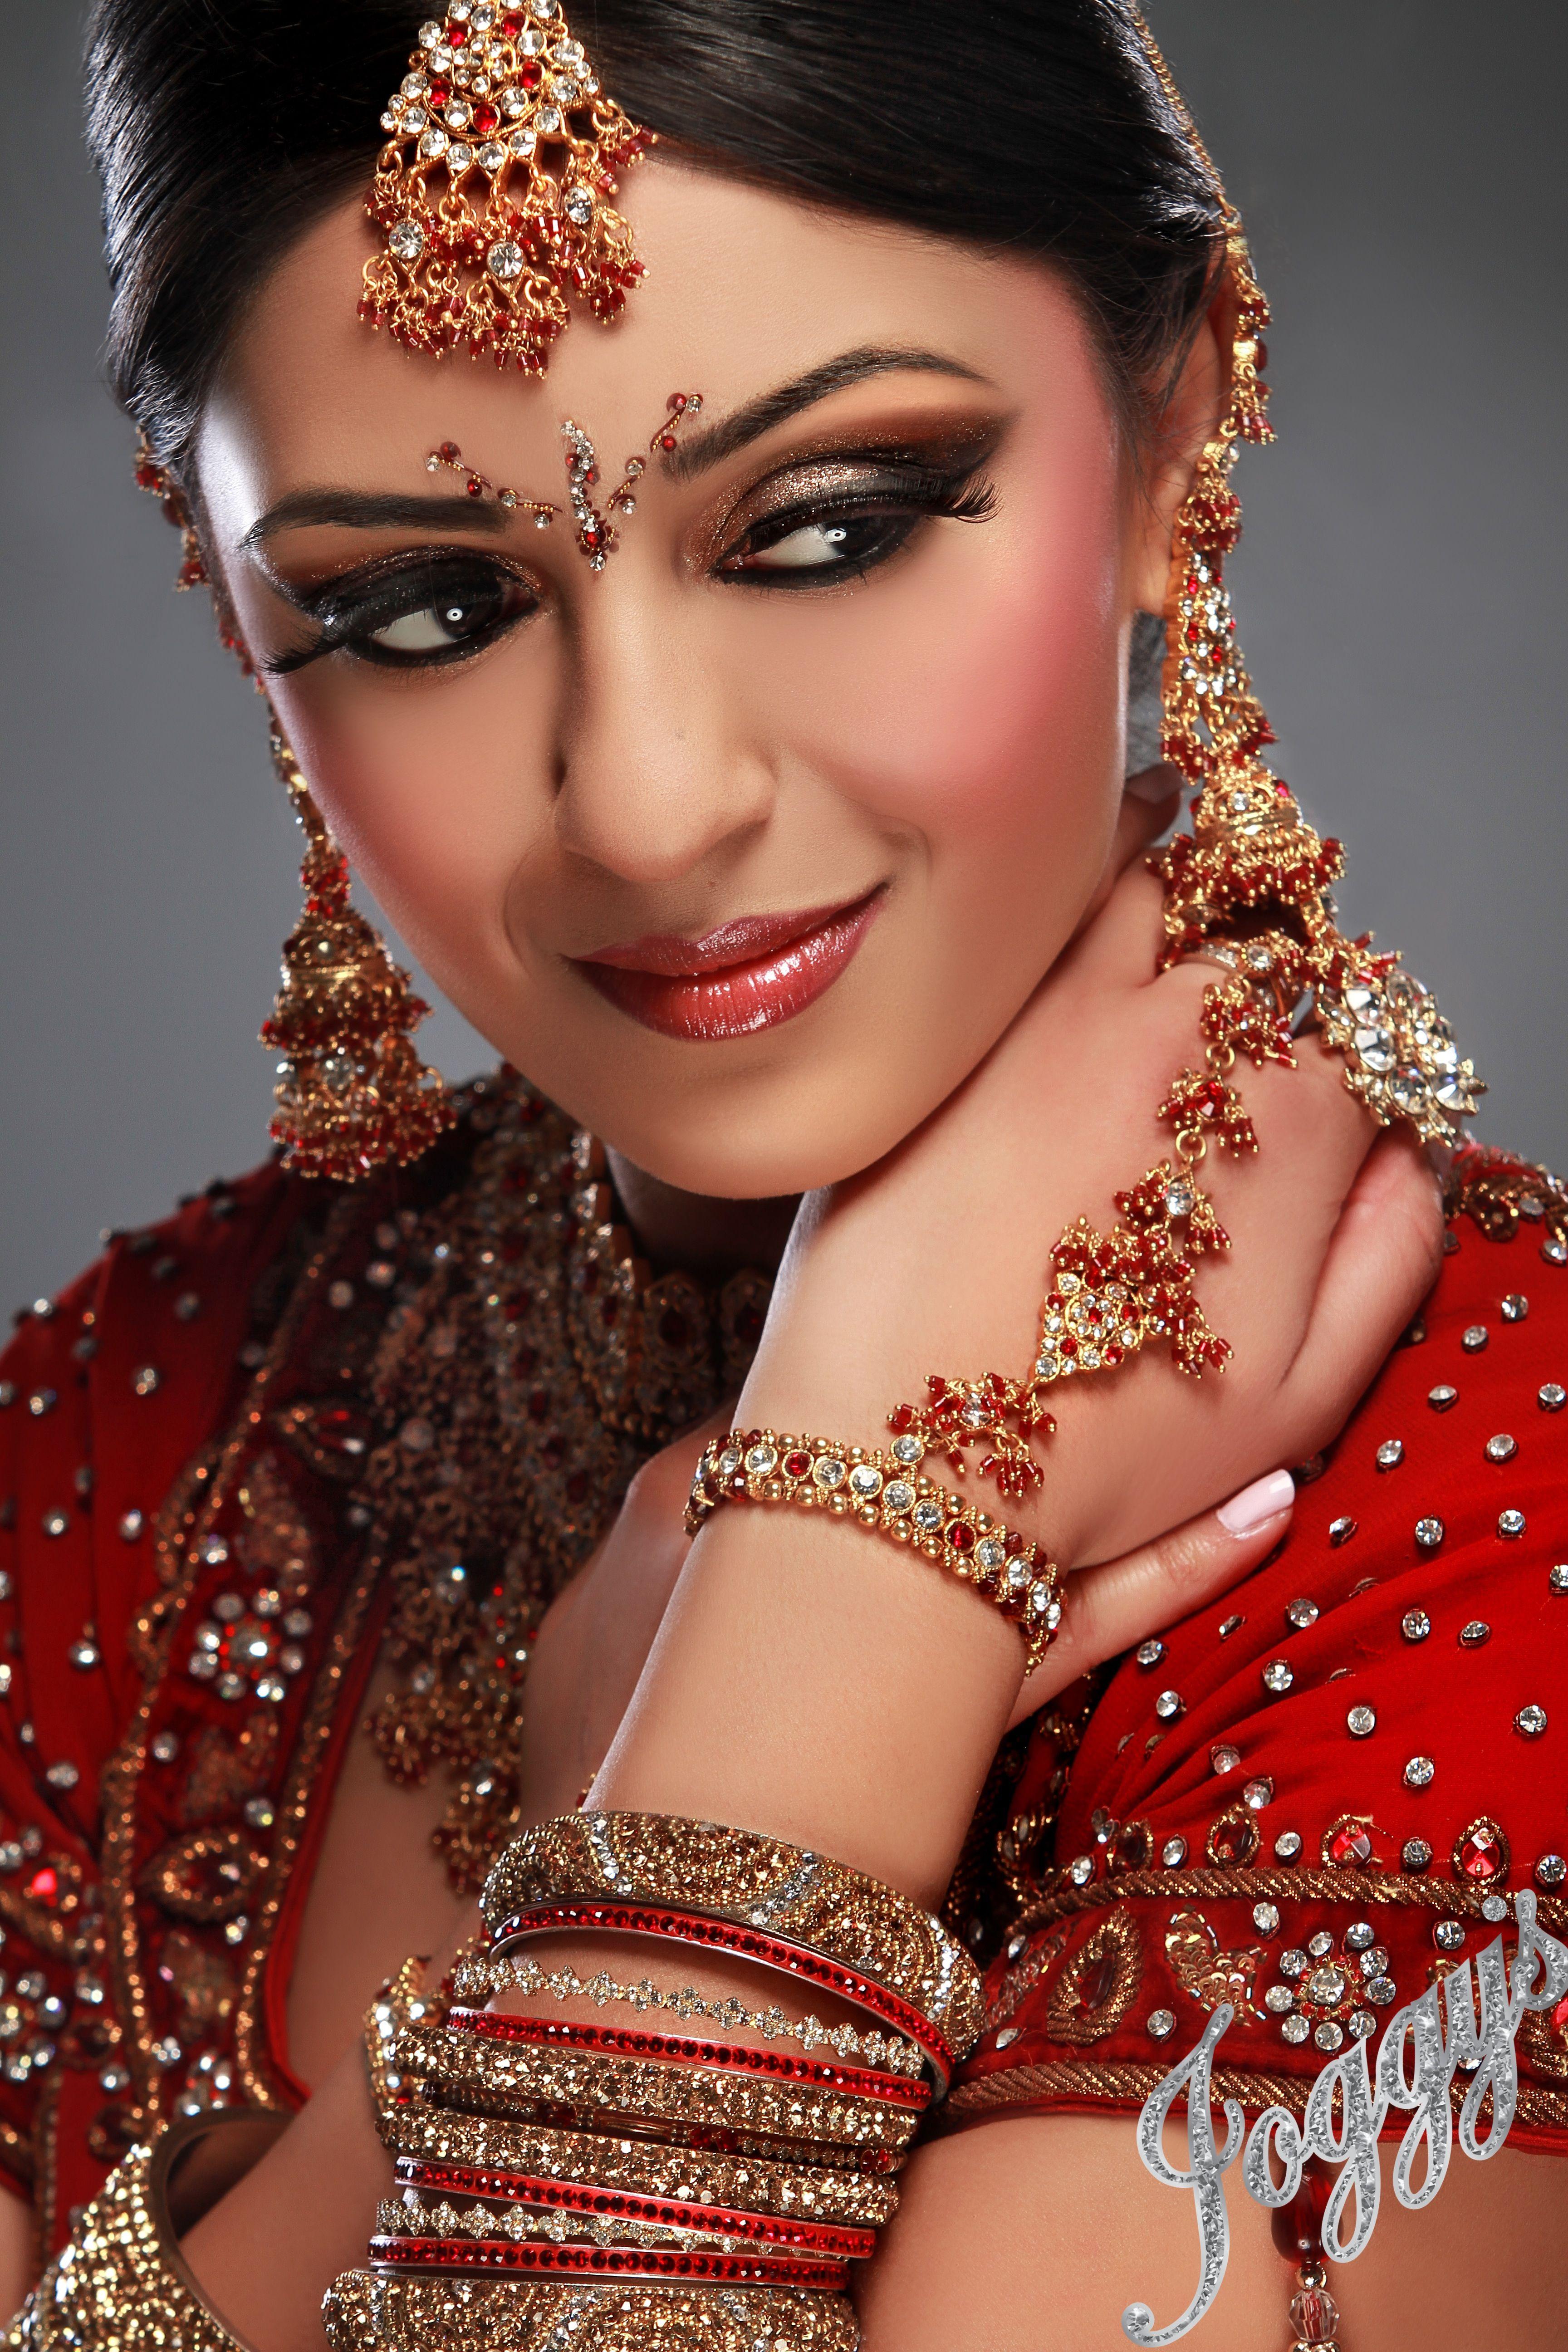 Pin von Beata Q@ auf Piękne sari i biżuteria | Pinterest